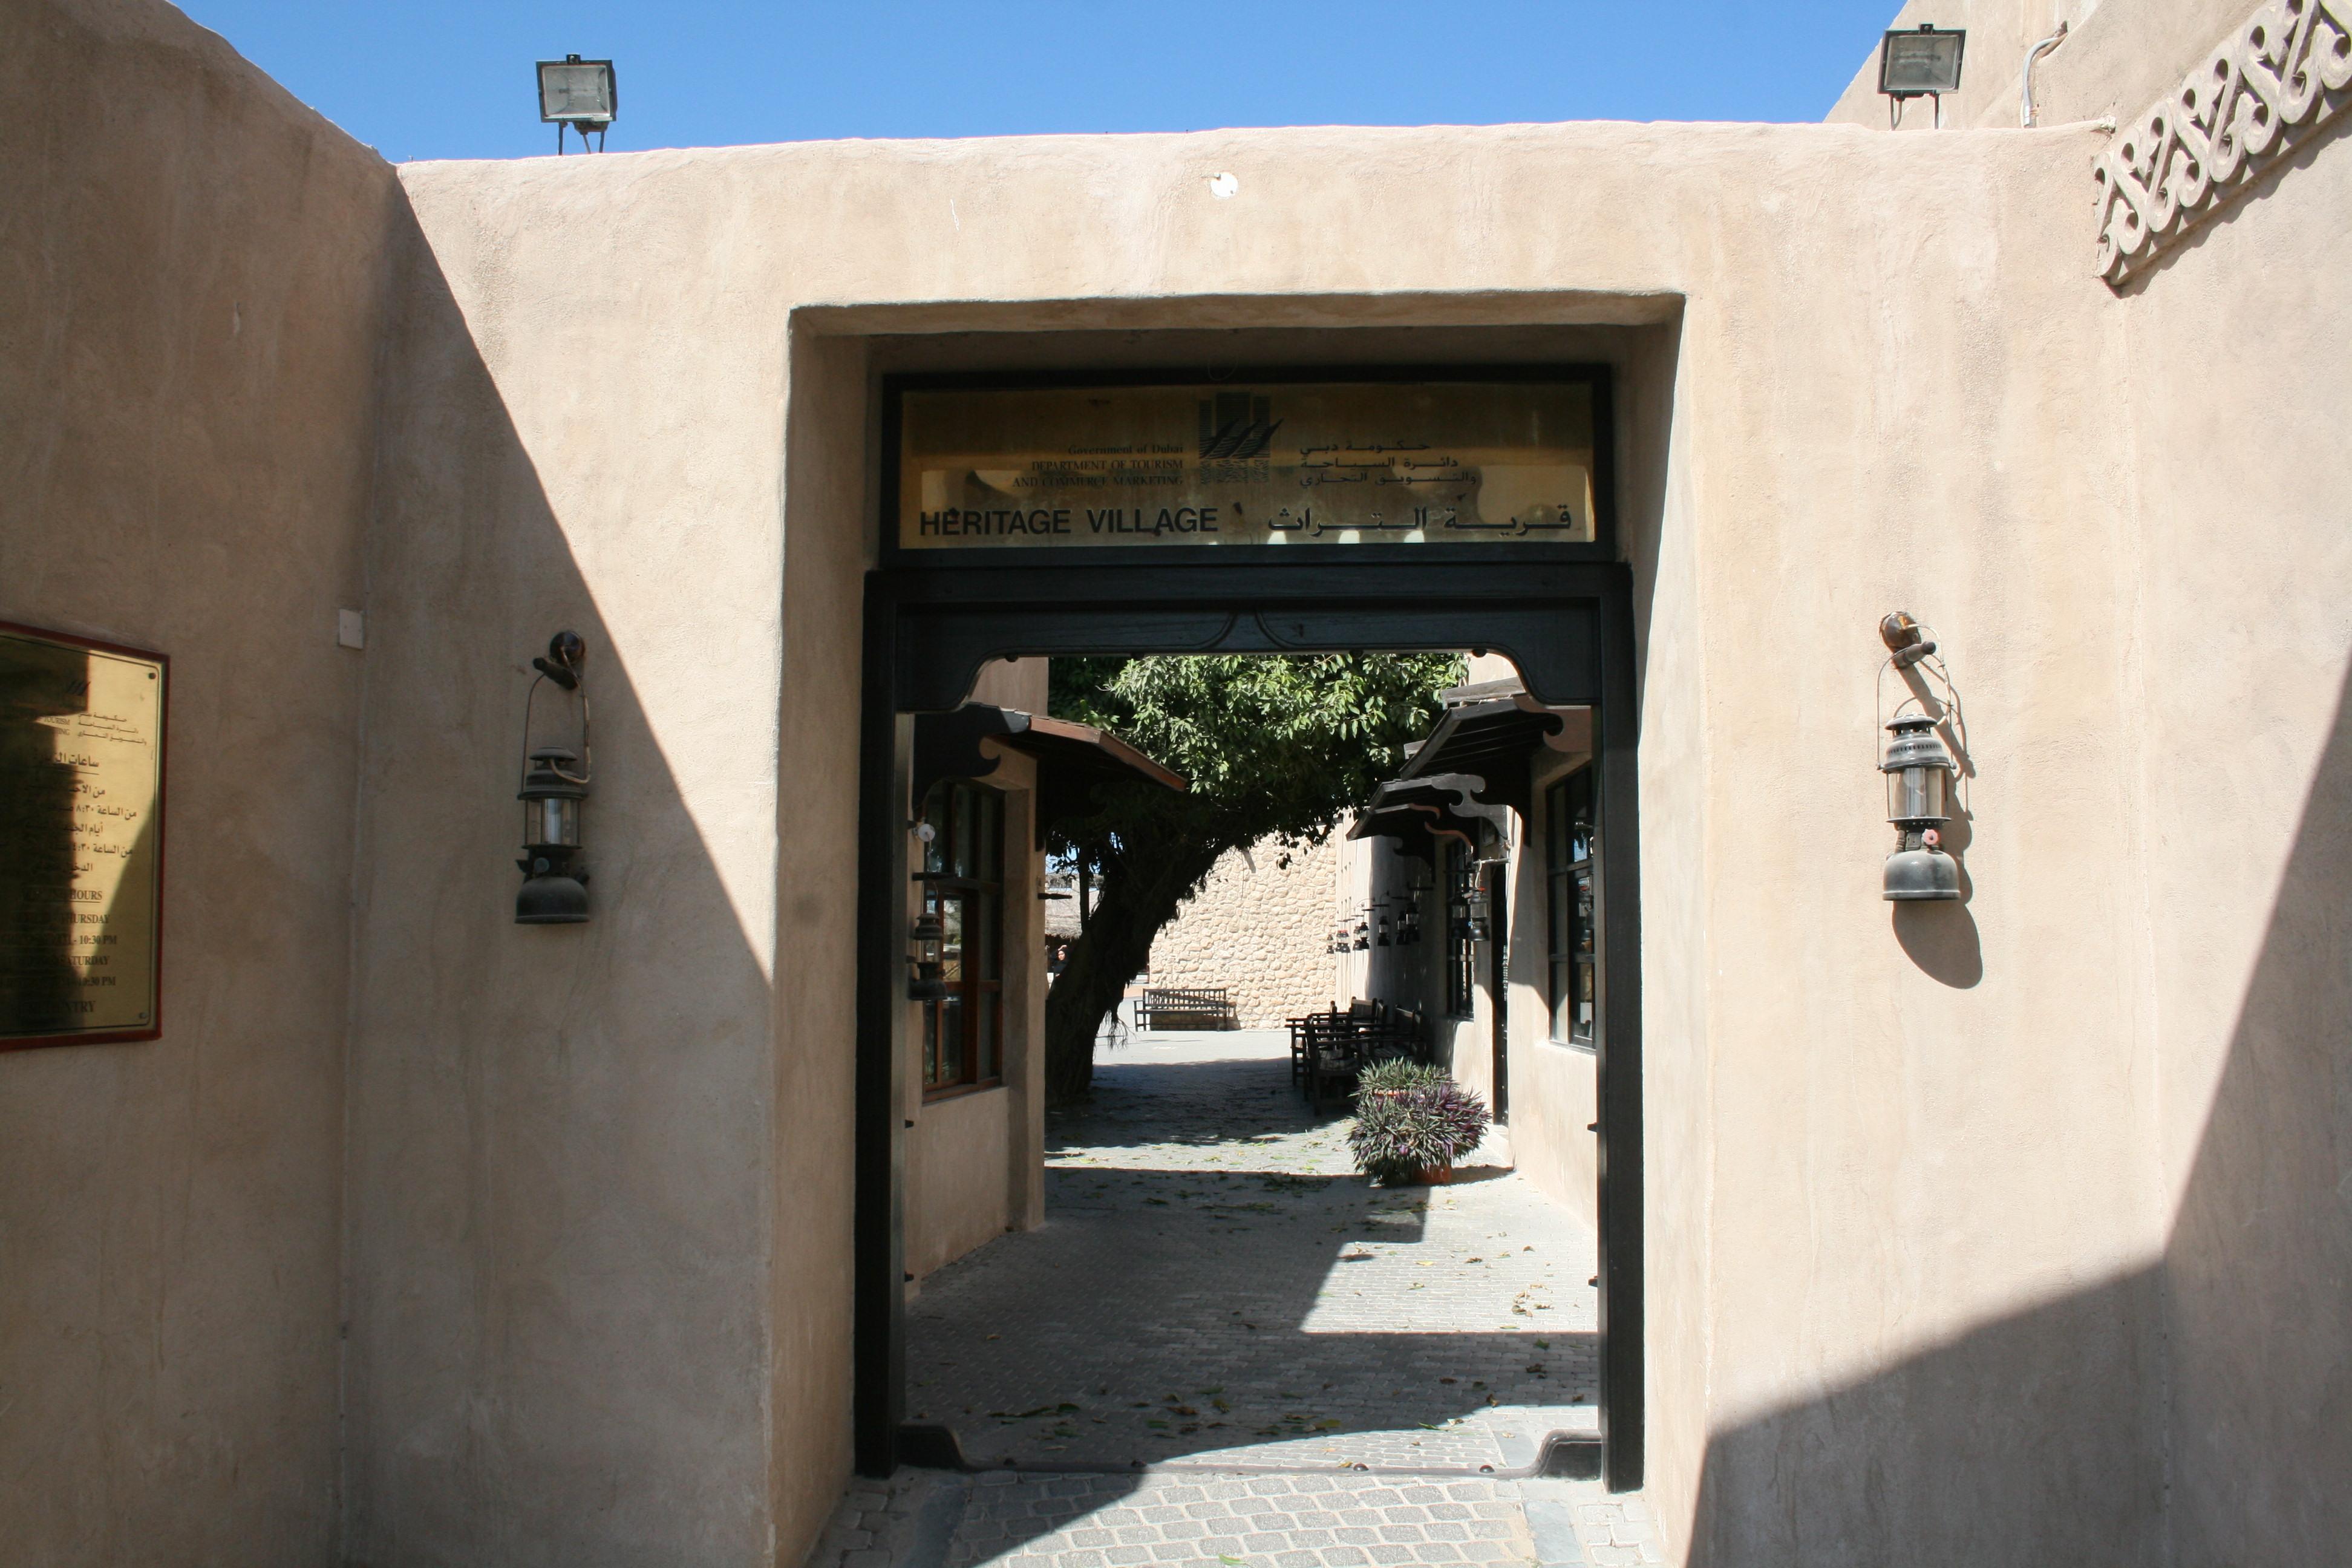 Heritage Village [ © Diego Delso/Wikimedia ]